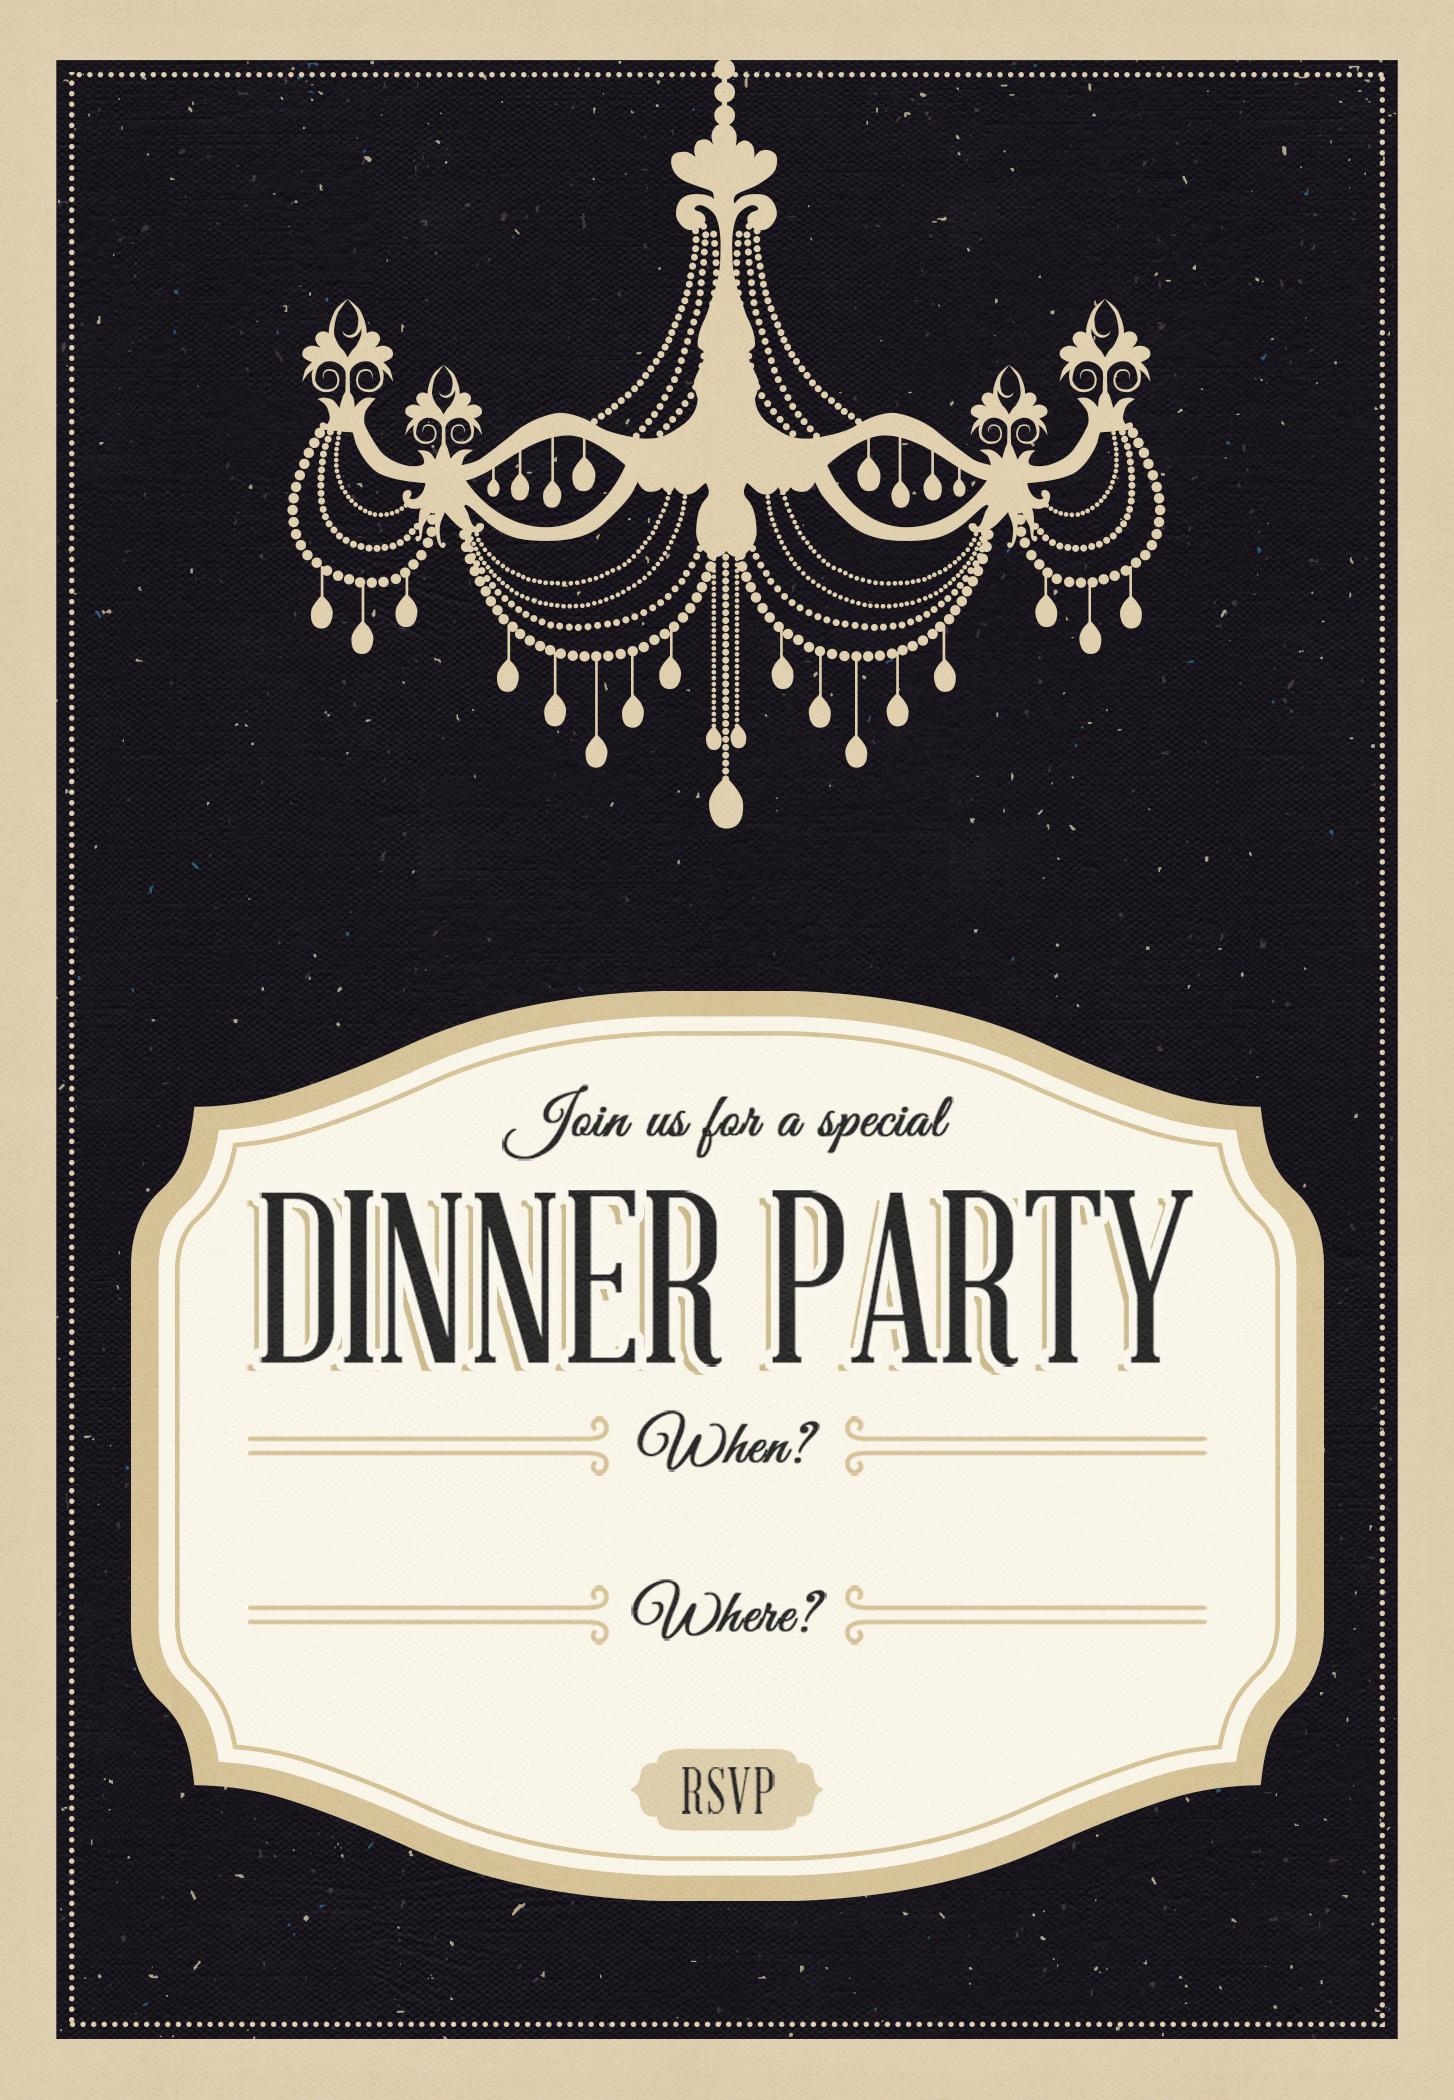 Abeadacddbeea List Of Dinner Party Invitation Templates Free